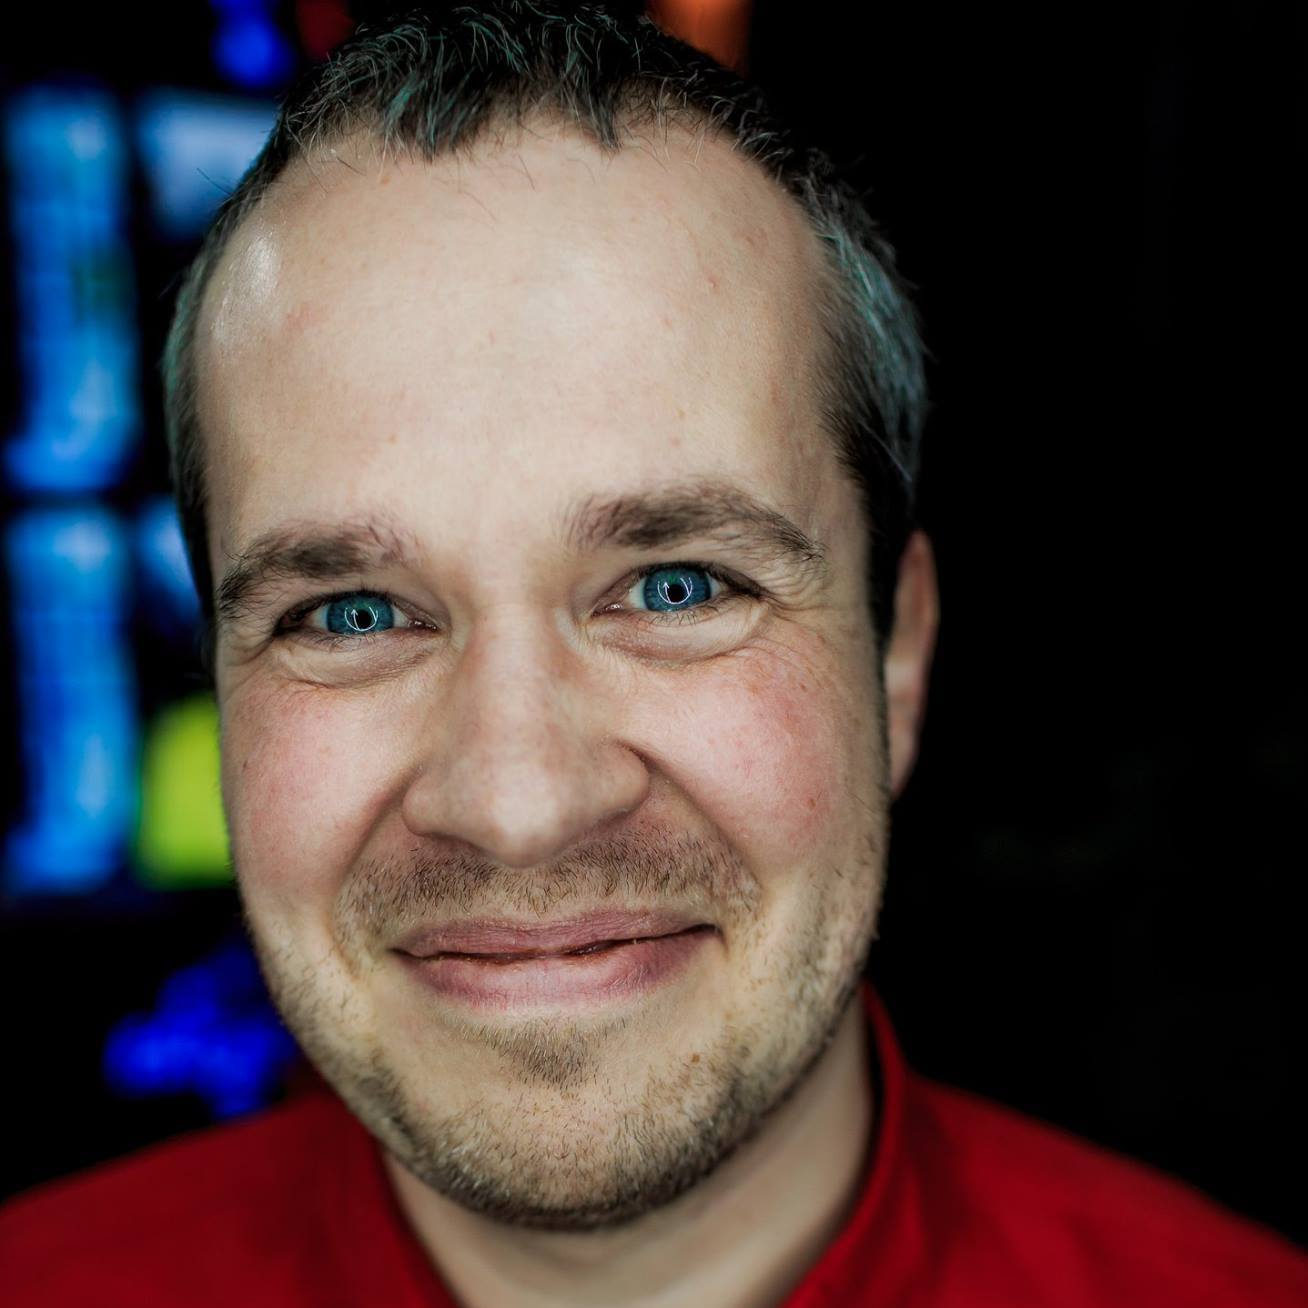 Кадры: маркетинг BlaBlaCar РФ возглавил Михаил Добров из World of Tanks СНГ